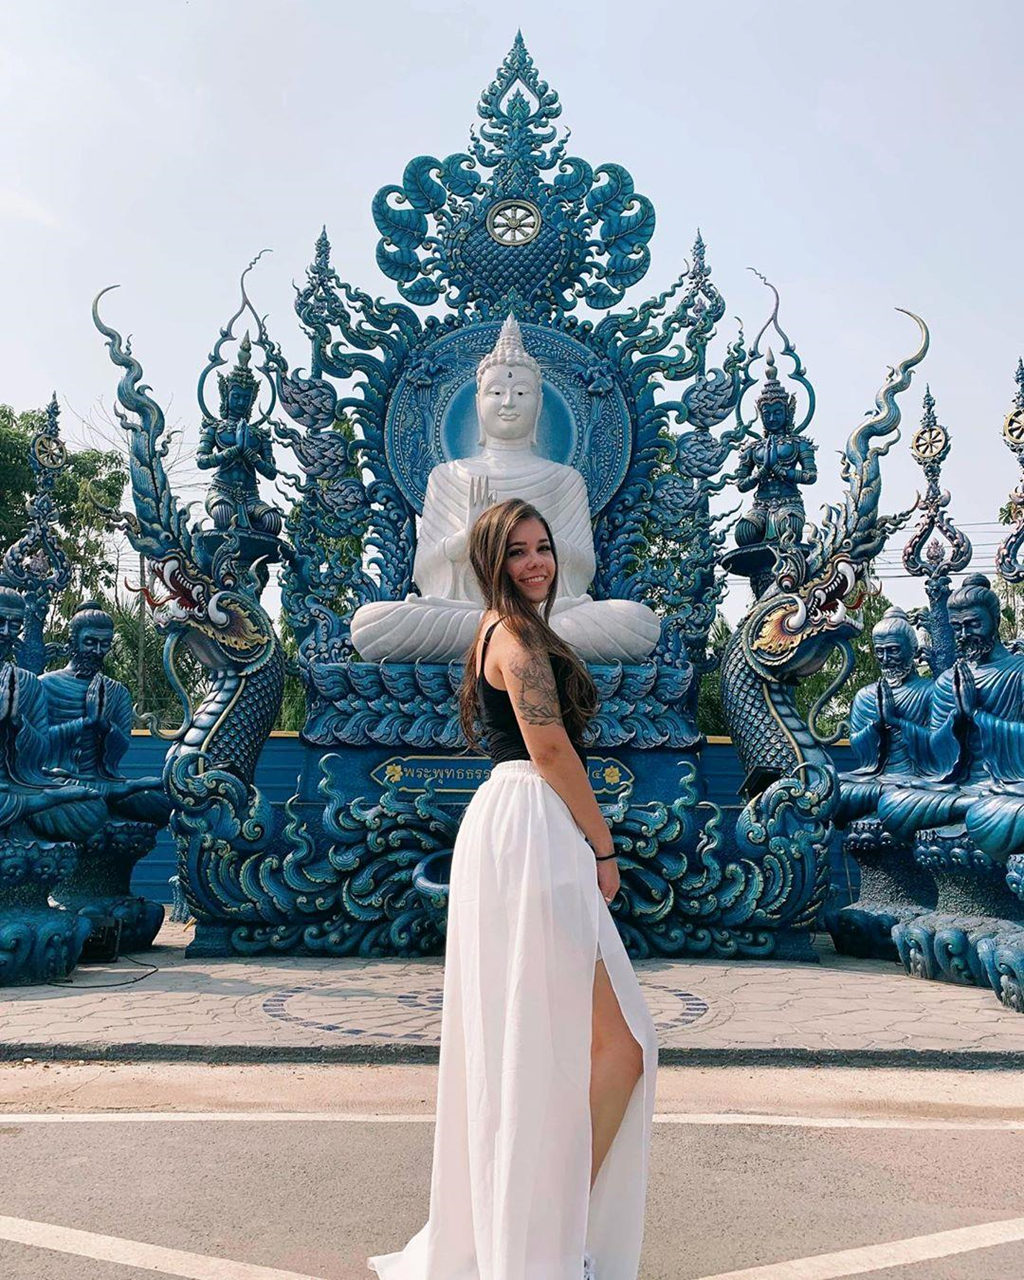 ghe-thai-lan-check-in-song-ao-tai-ngoi-chua-xanh-dat-vang-sang-chanh-ivivu-8